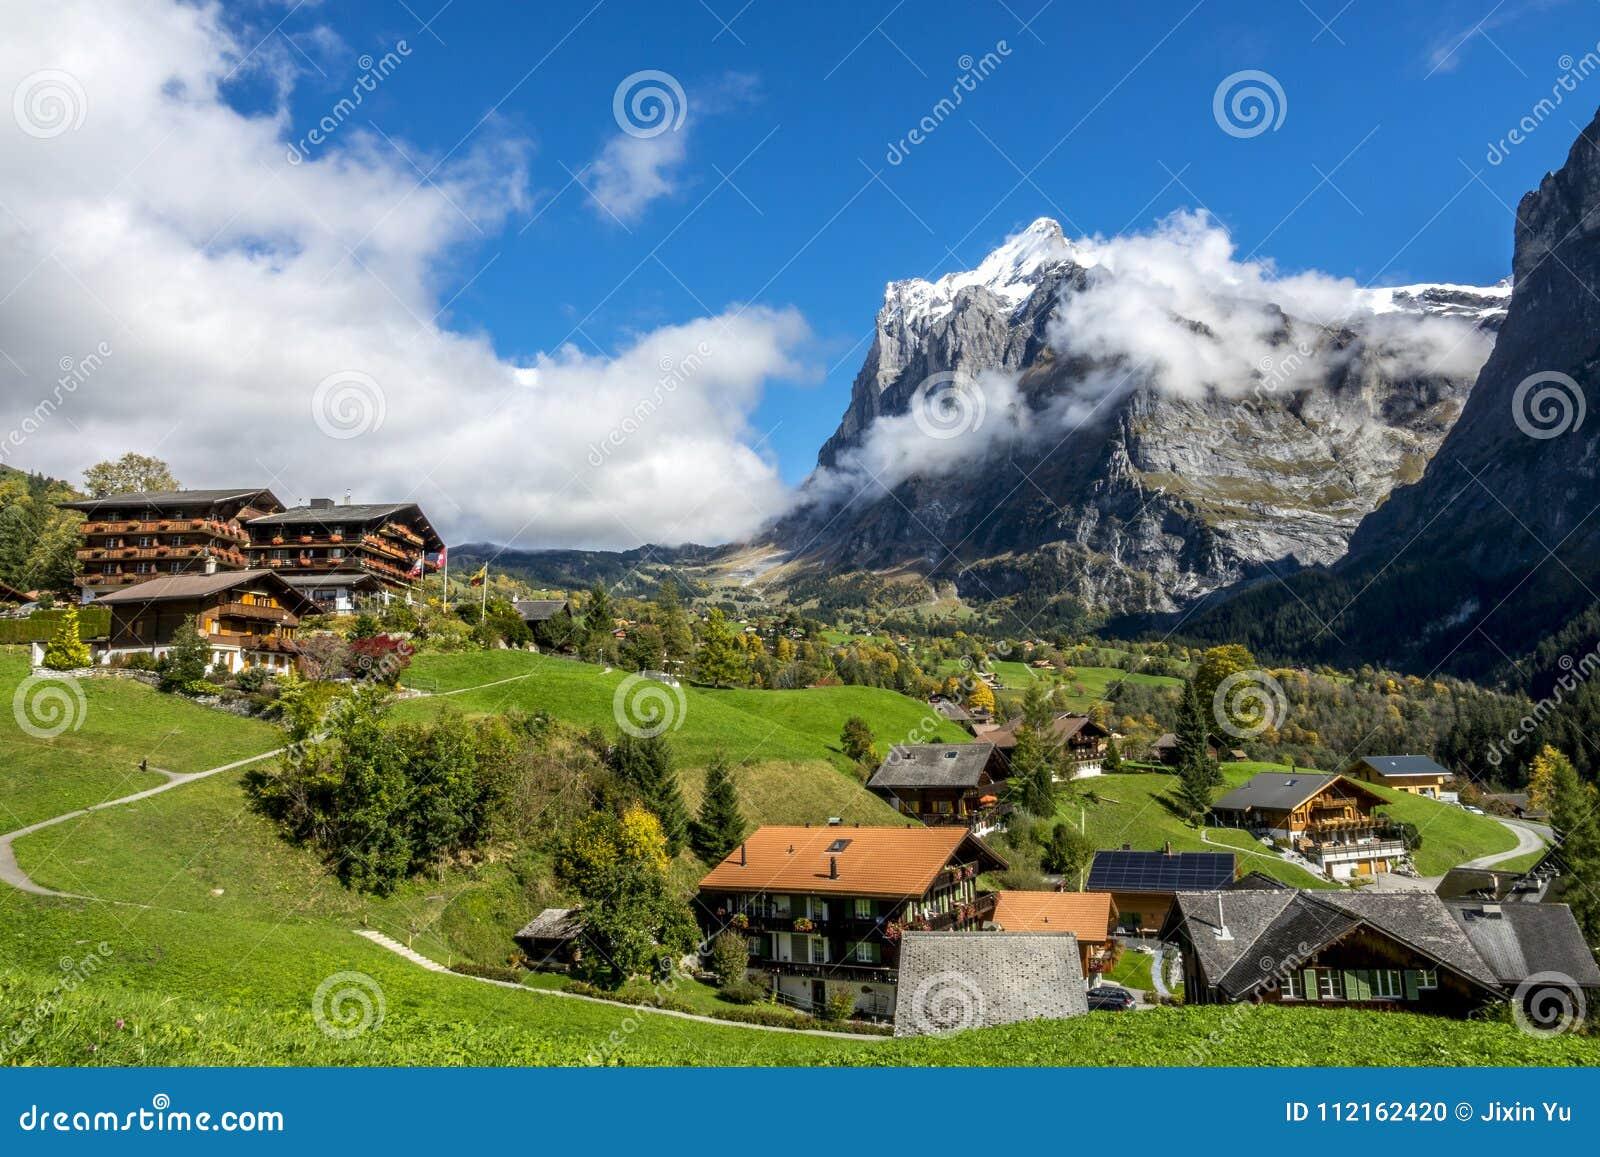 Amazing Dream Like Swiss Alpine Mountain Landscape Stock